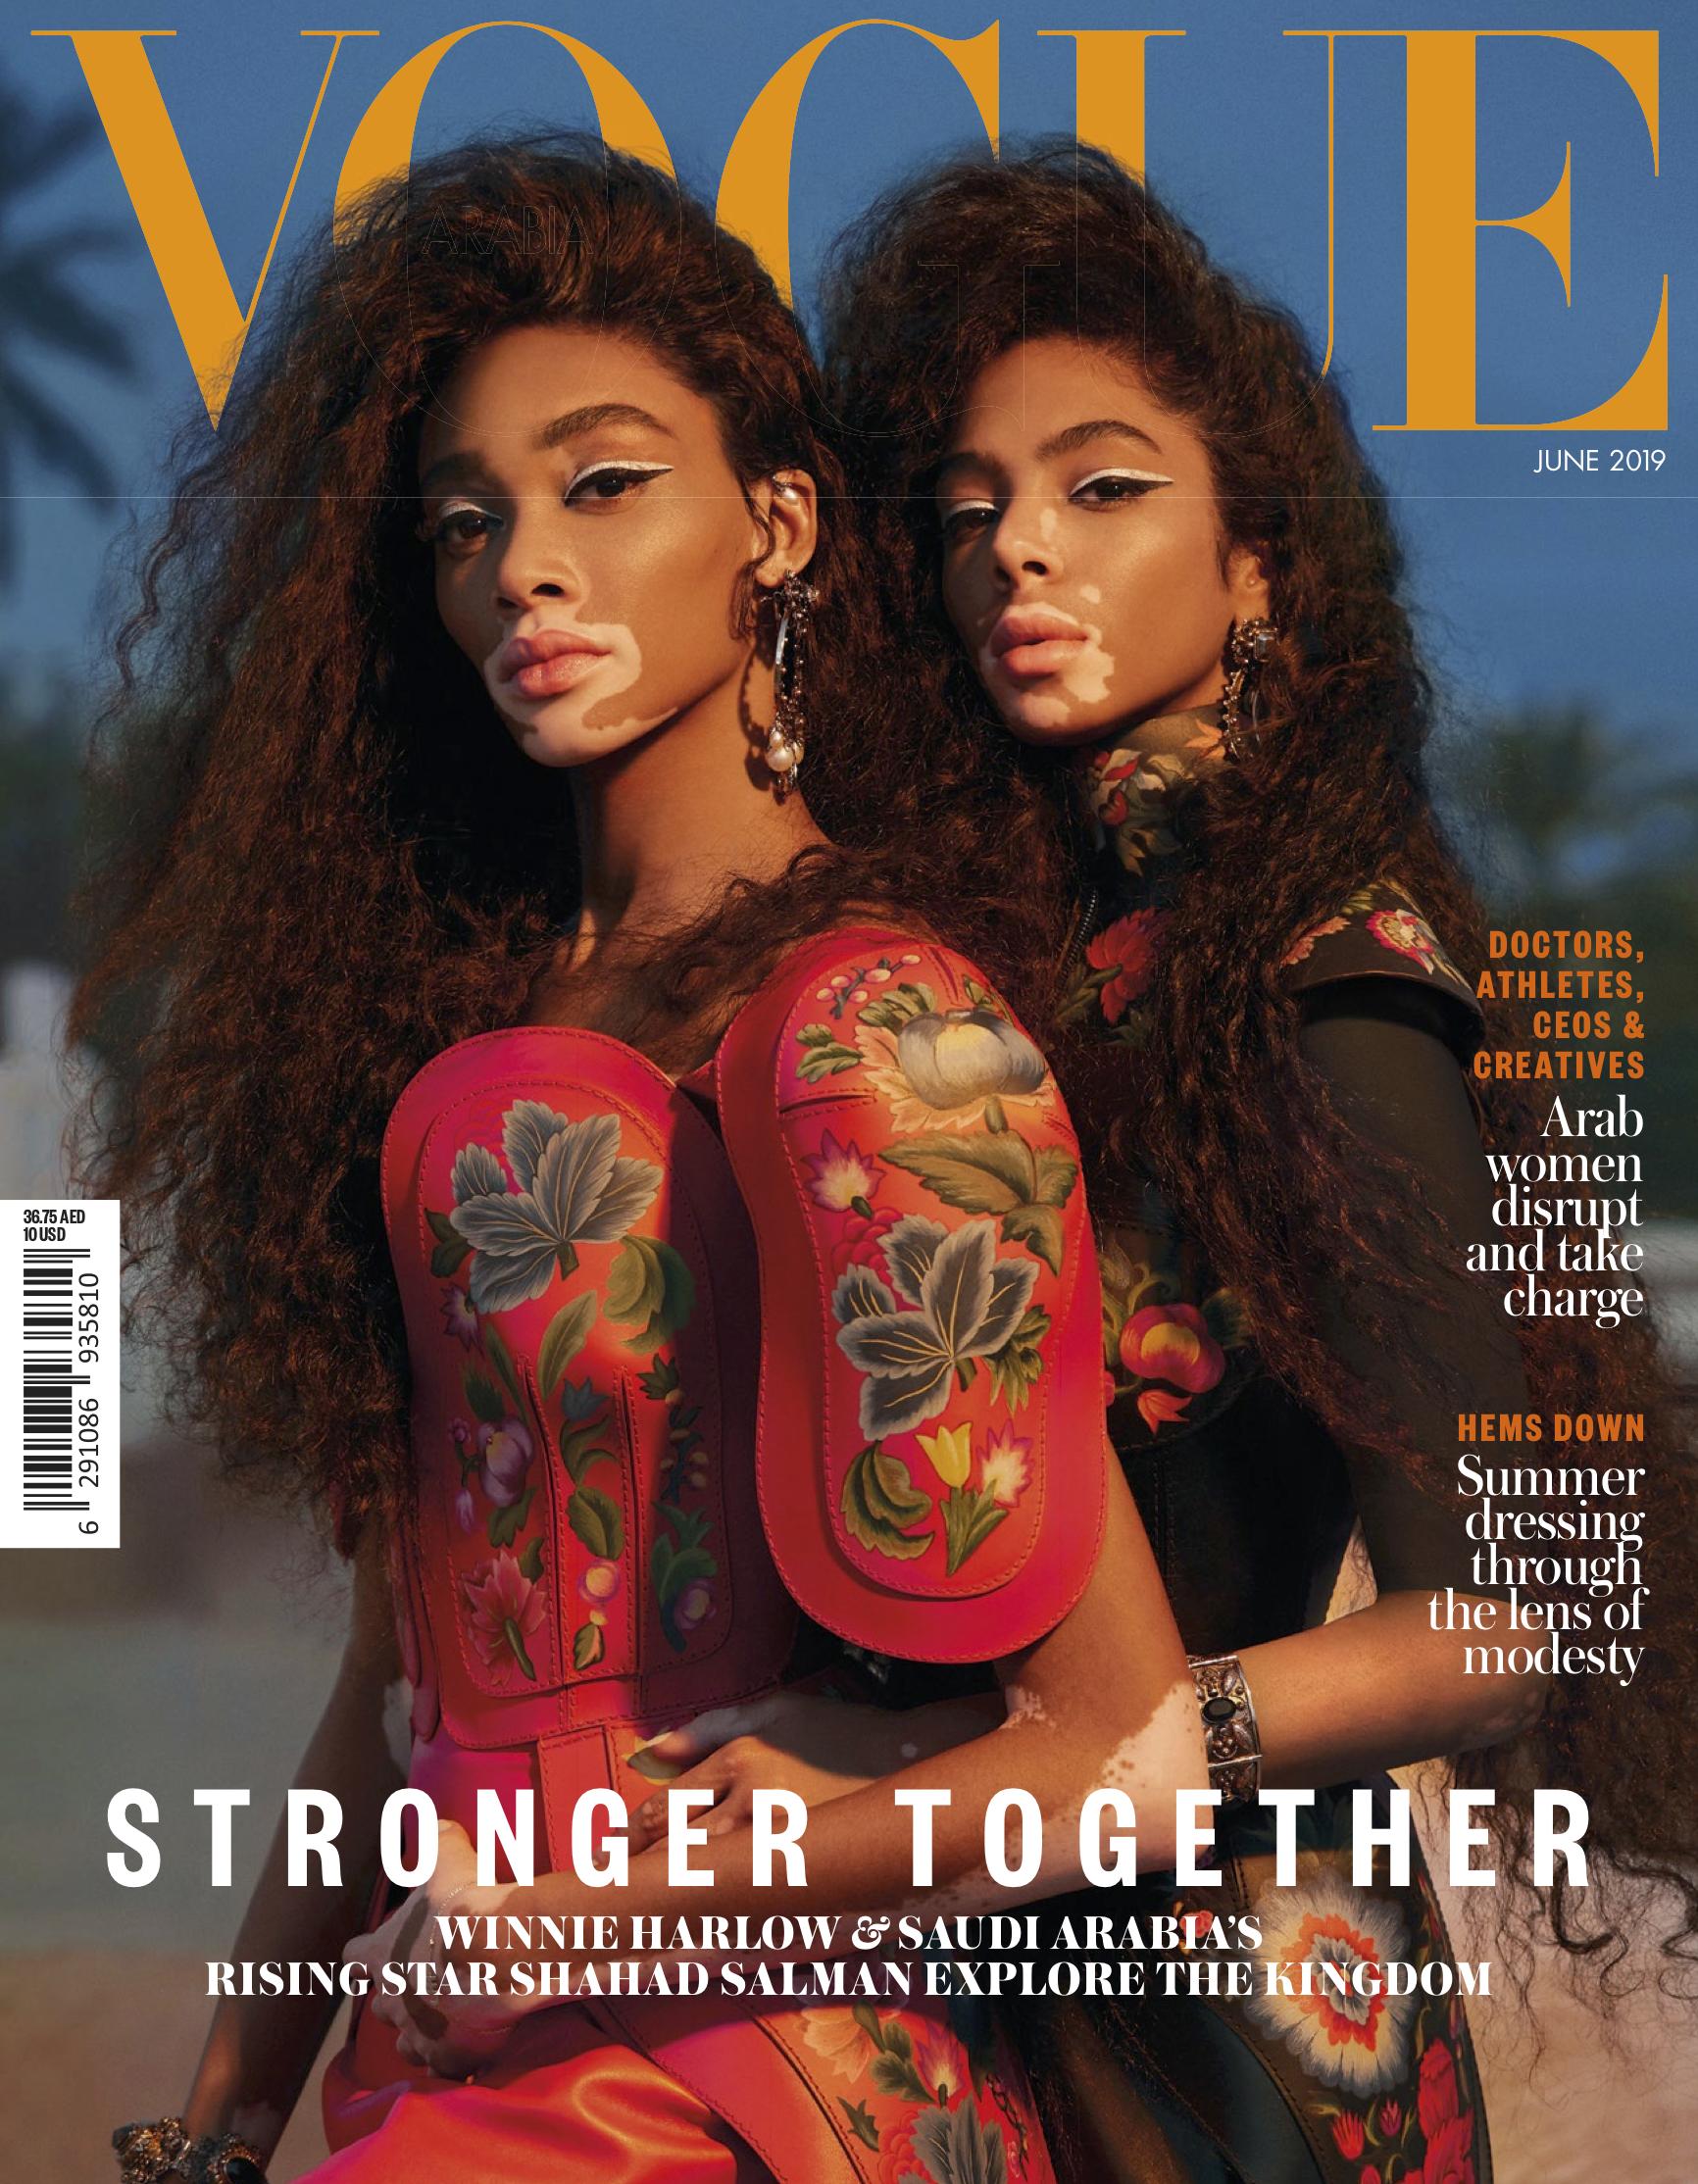 Winnie Harlow & Shahad Salman x Vogue Arabia